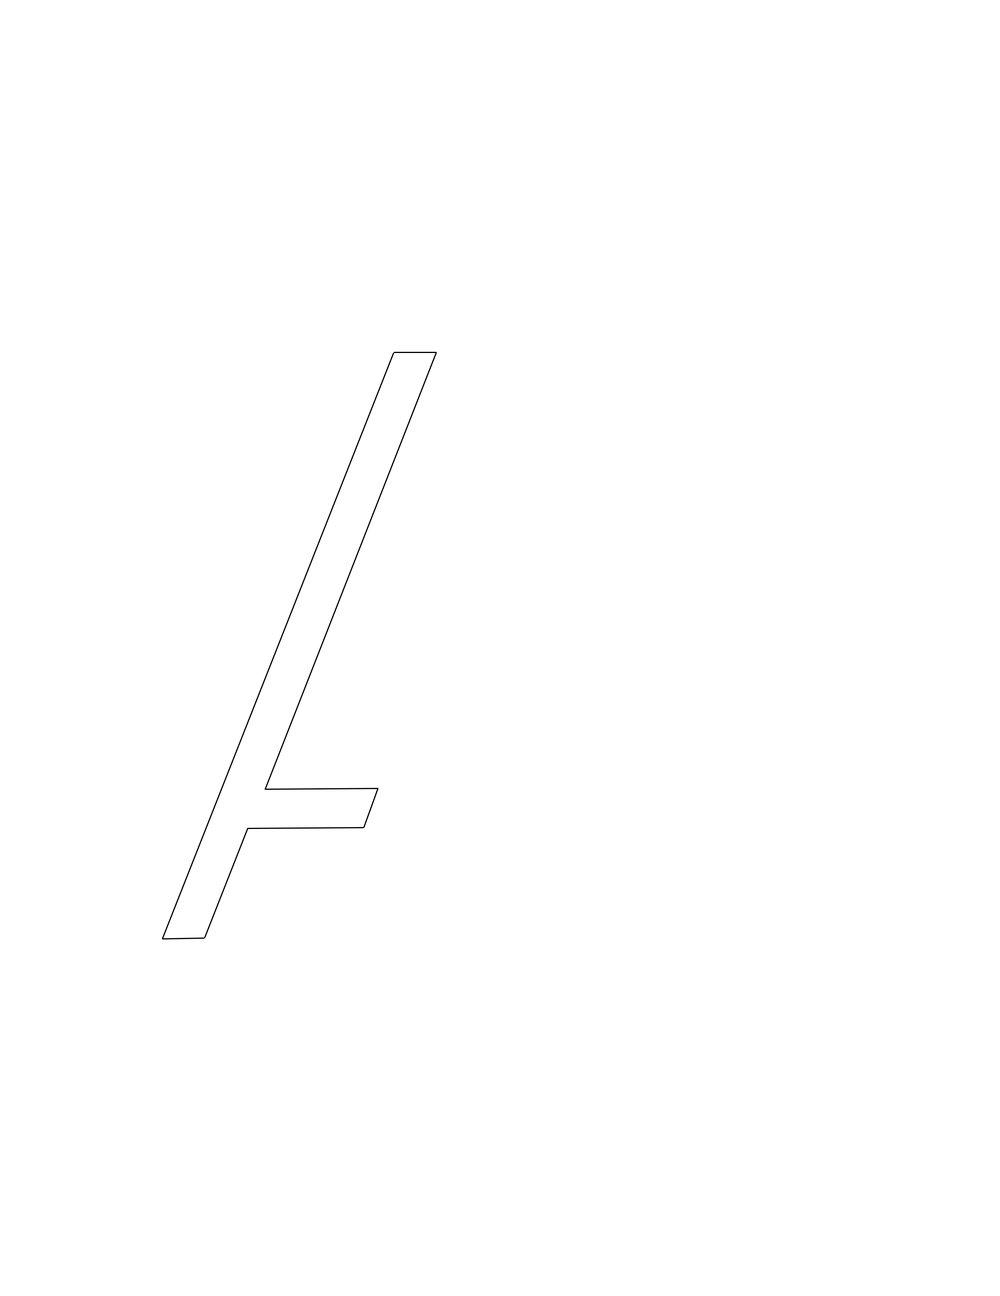 A 004.jpg